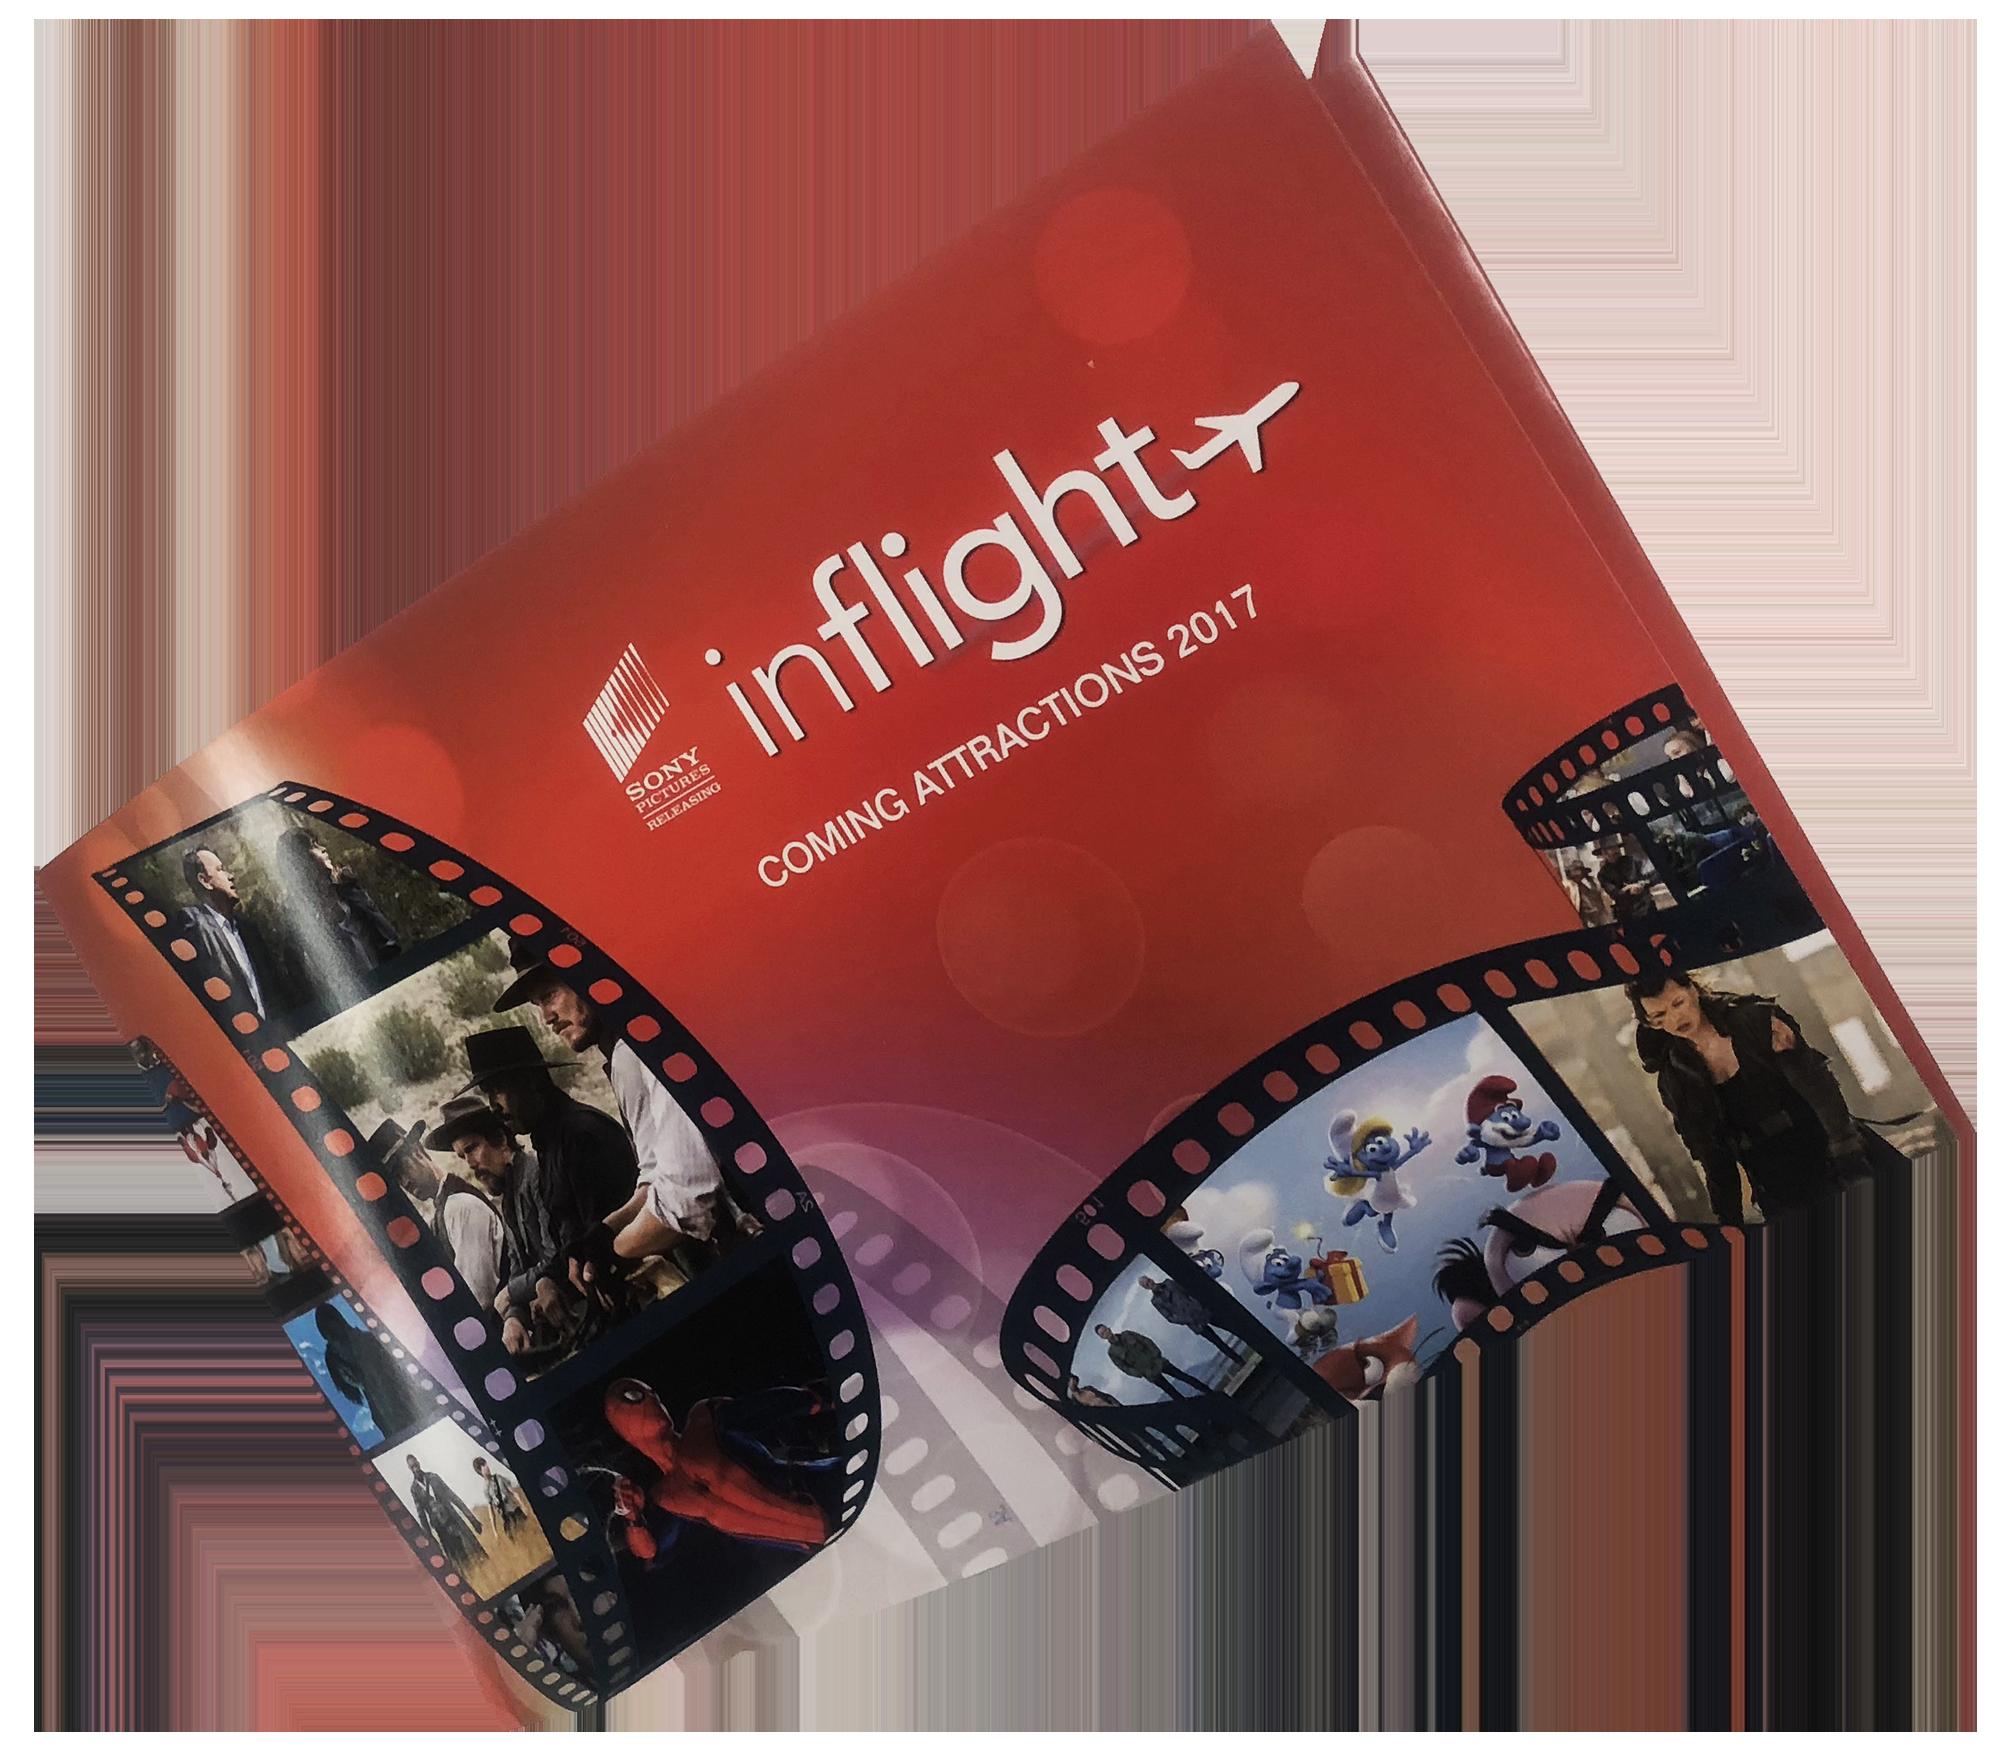 Brochure Print Sample - Saddle stich, Digital Printing, 4 Color